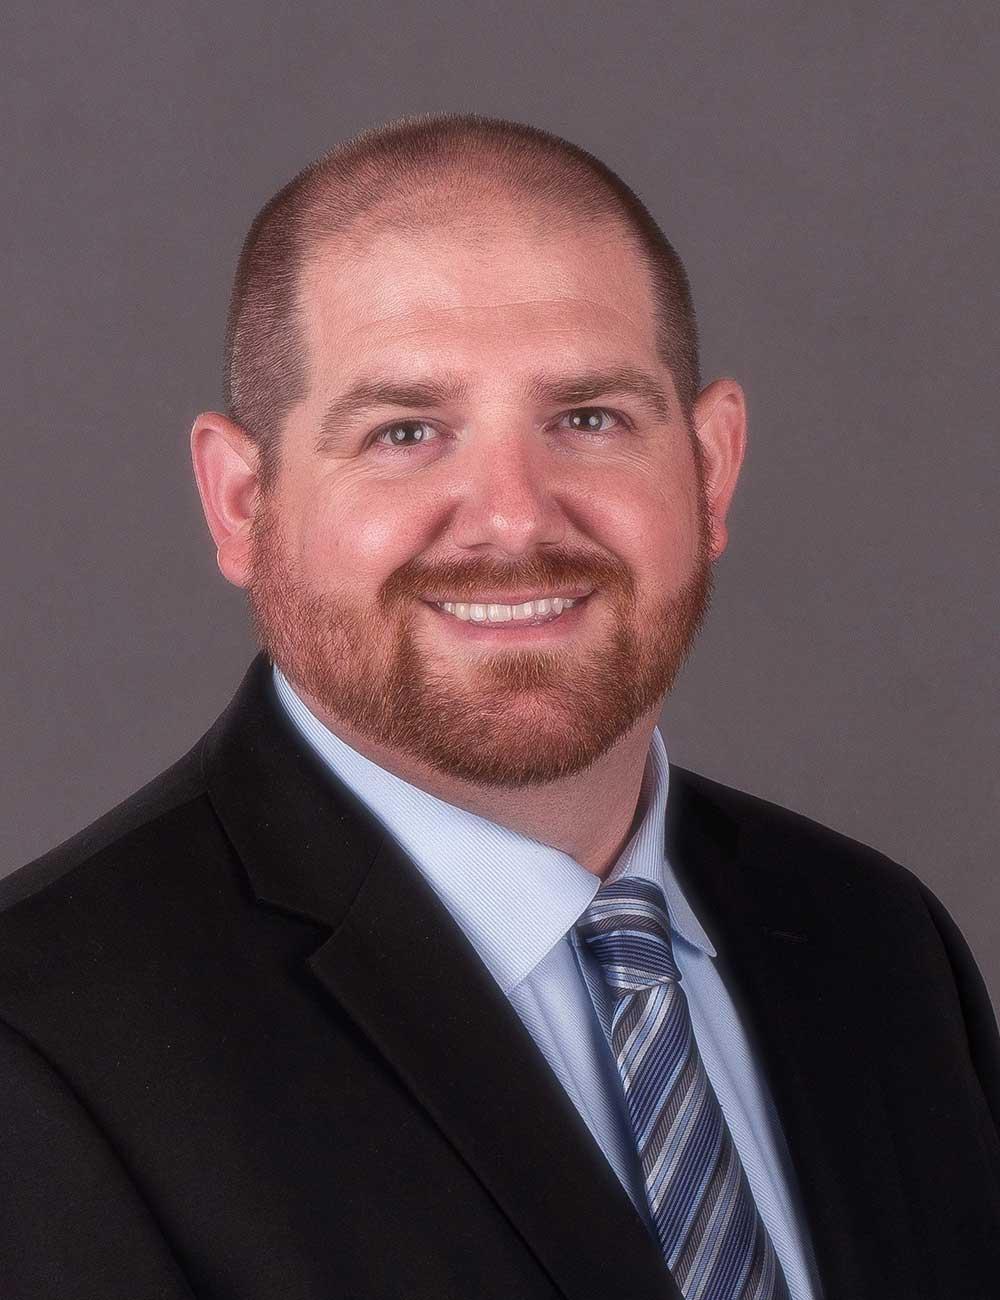 Mark J. Nicoli